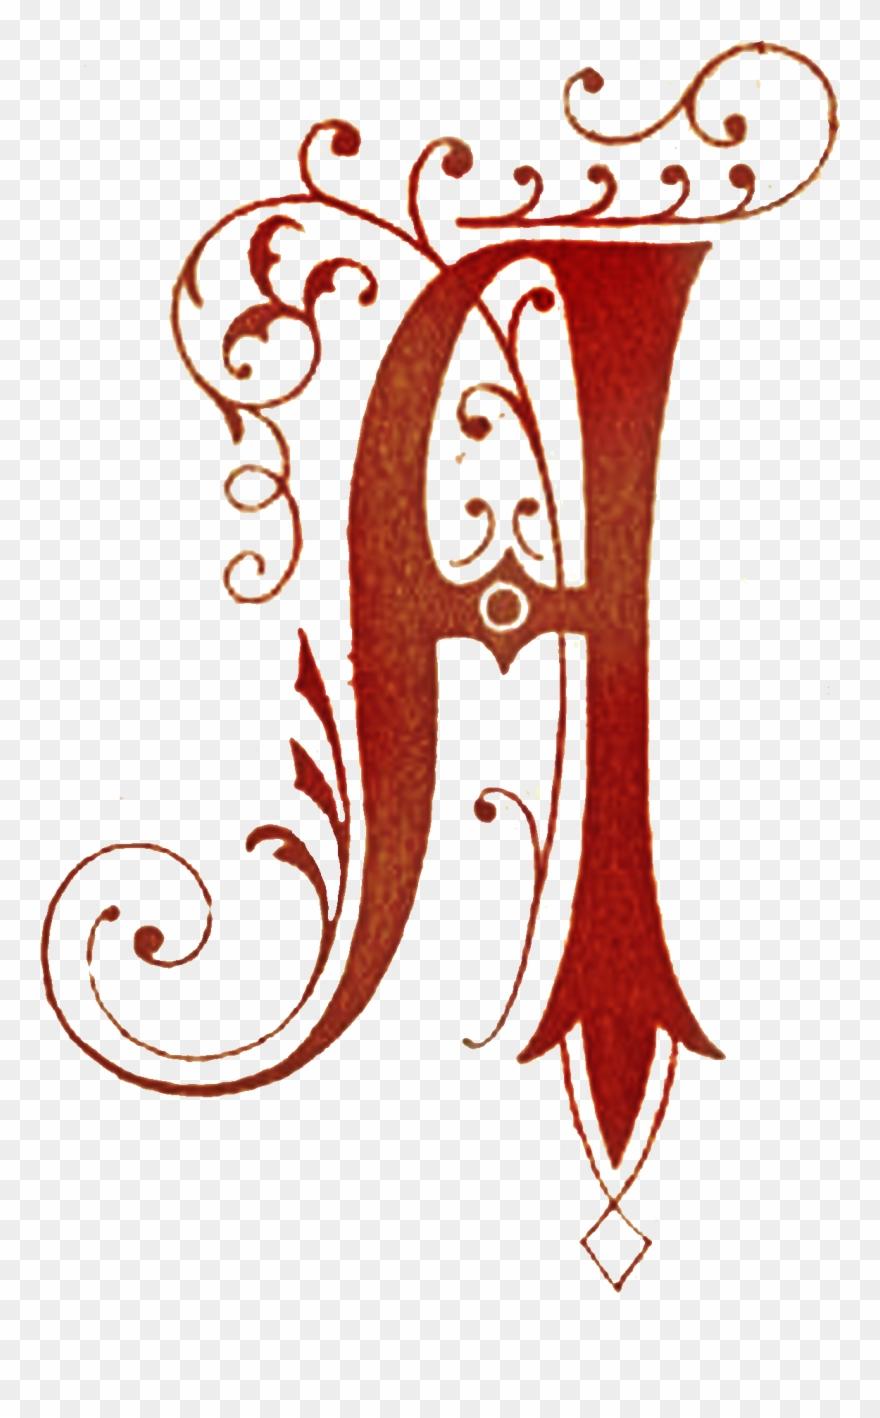 Fancy letter a clipart